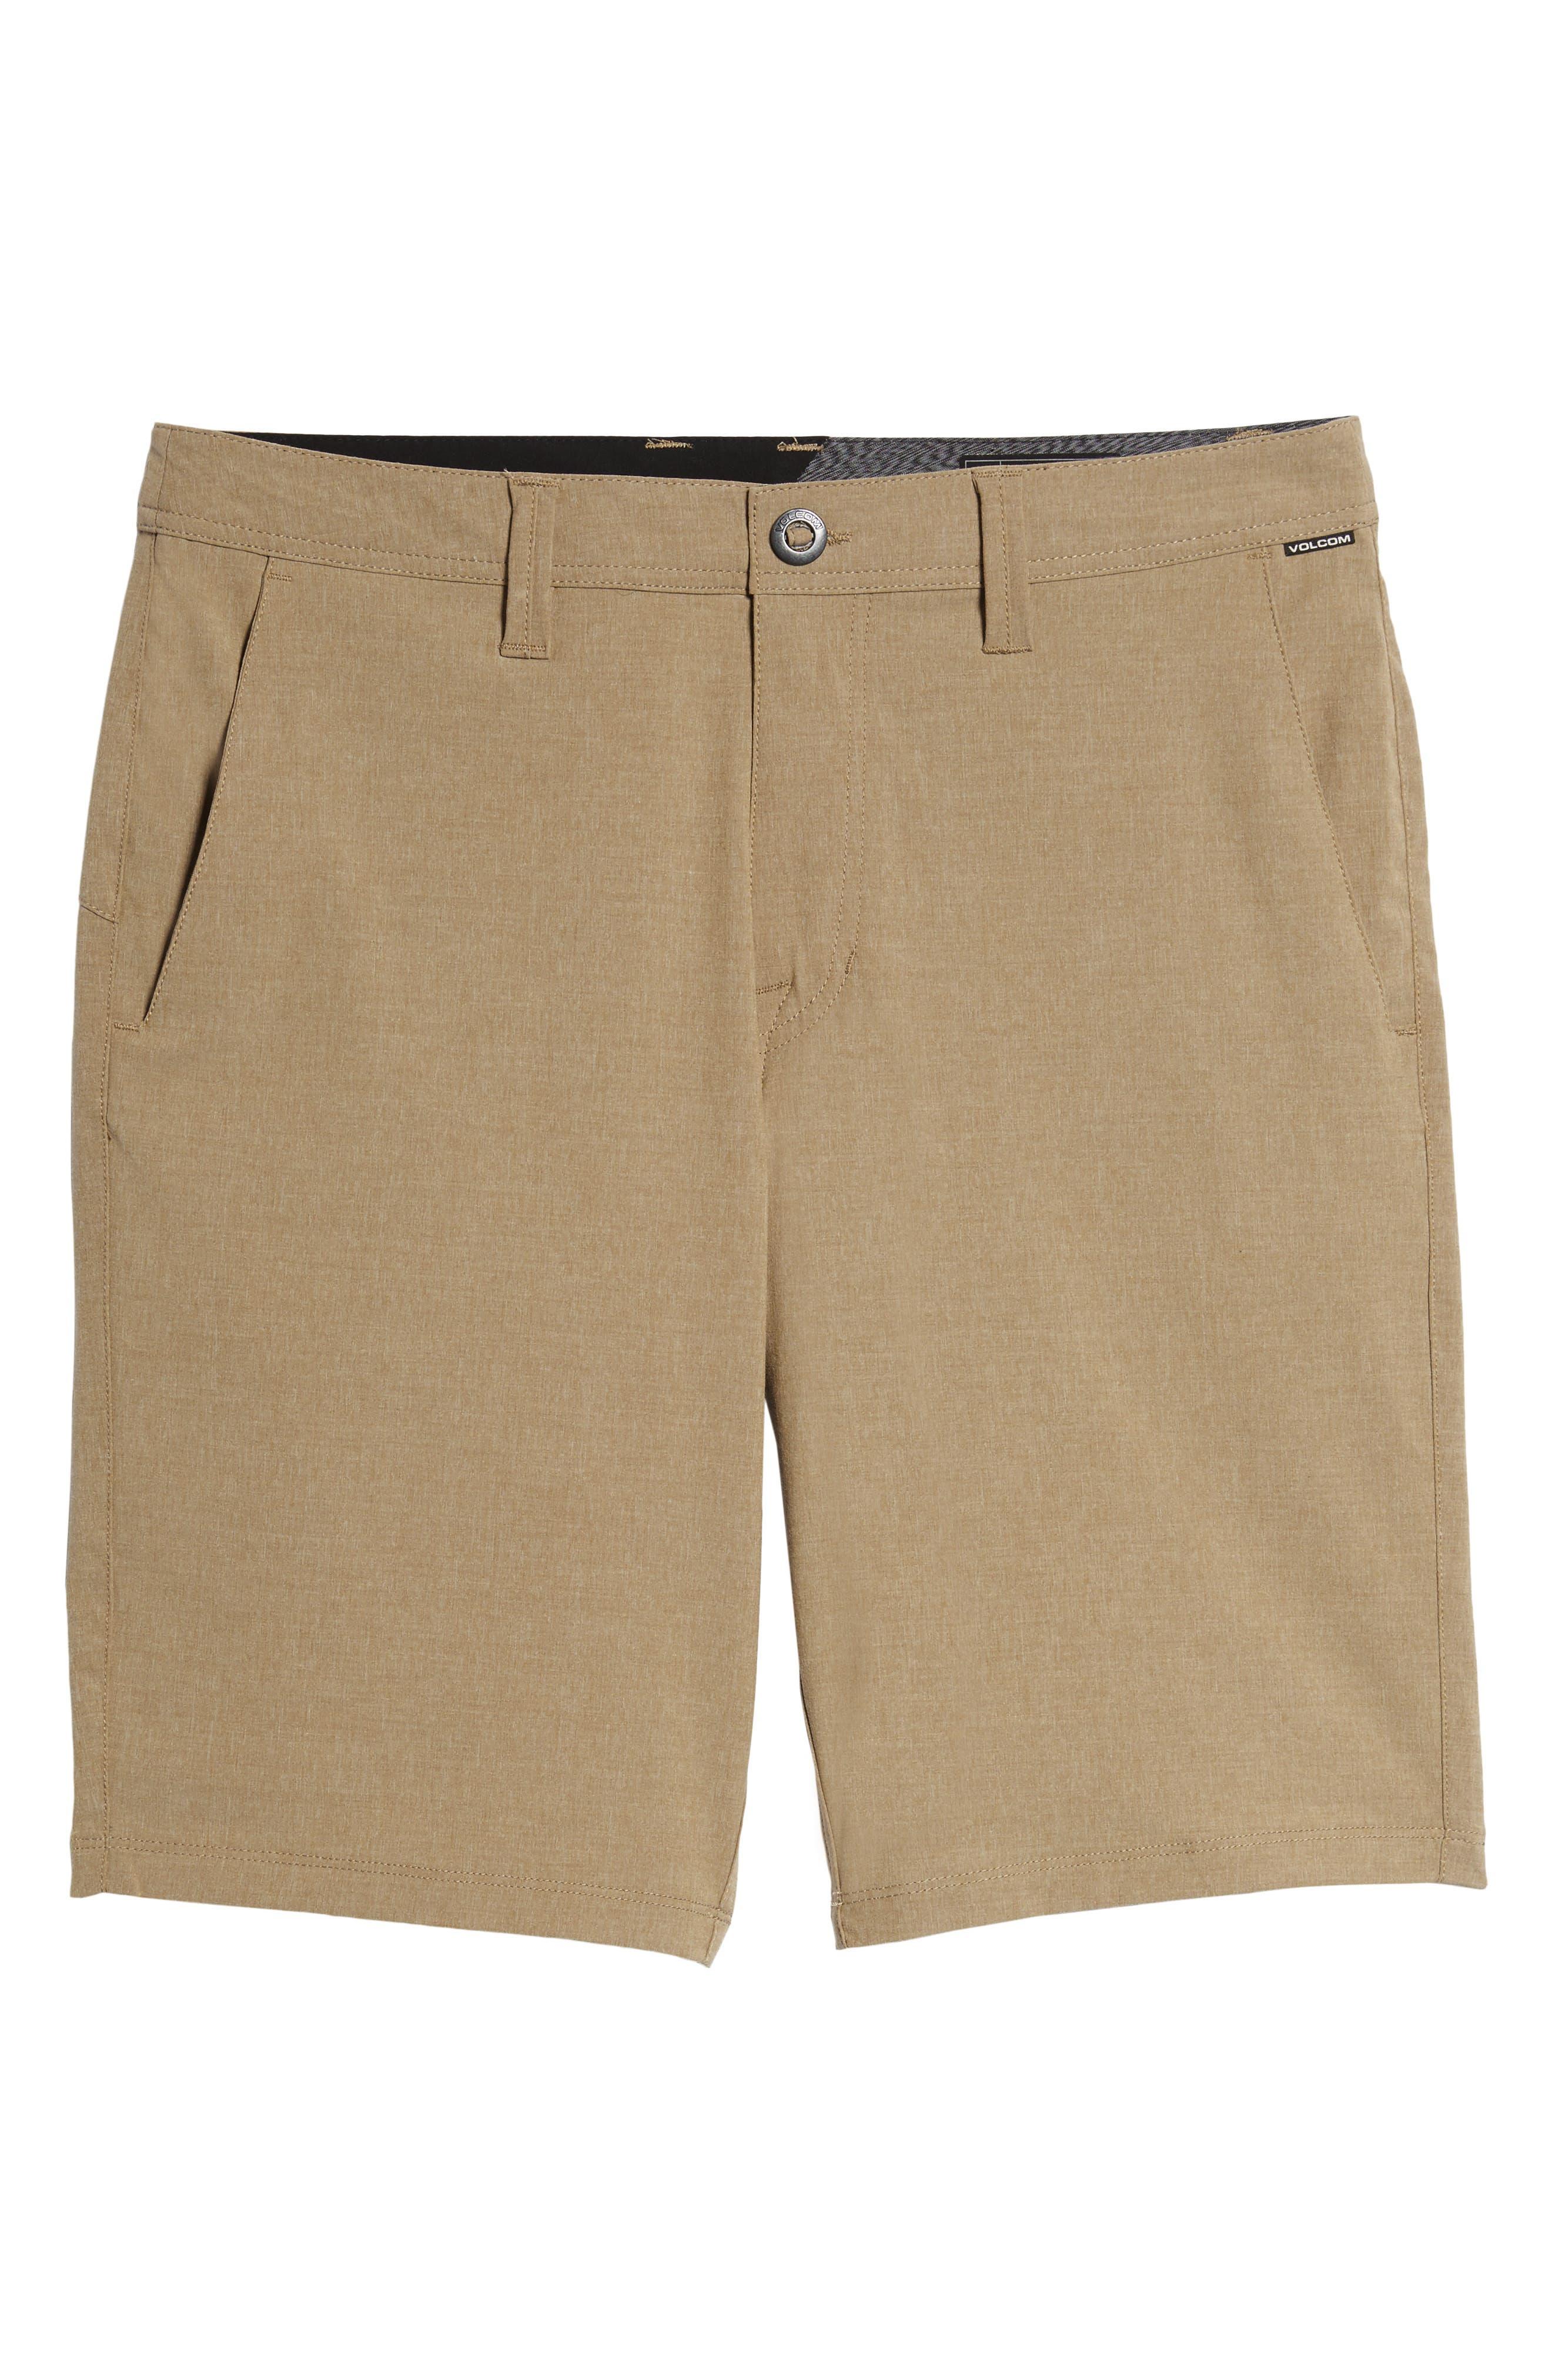 Hybrid Shorts,                             Alternate thumbnail 6, color,                             BEIGE